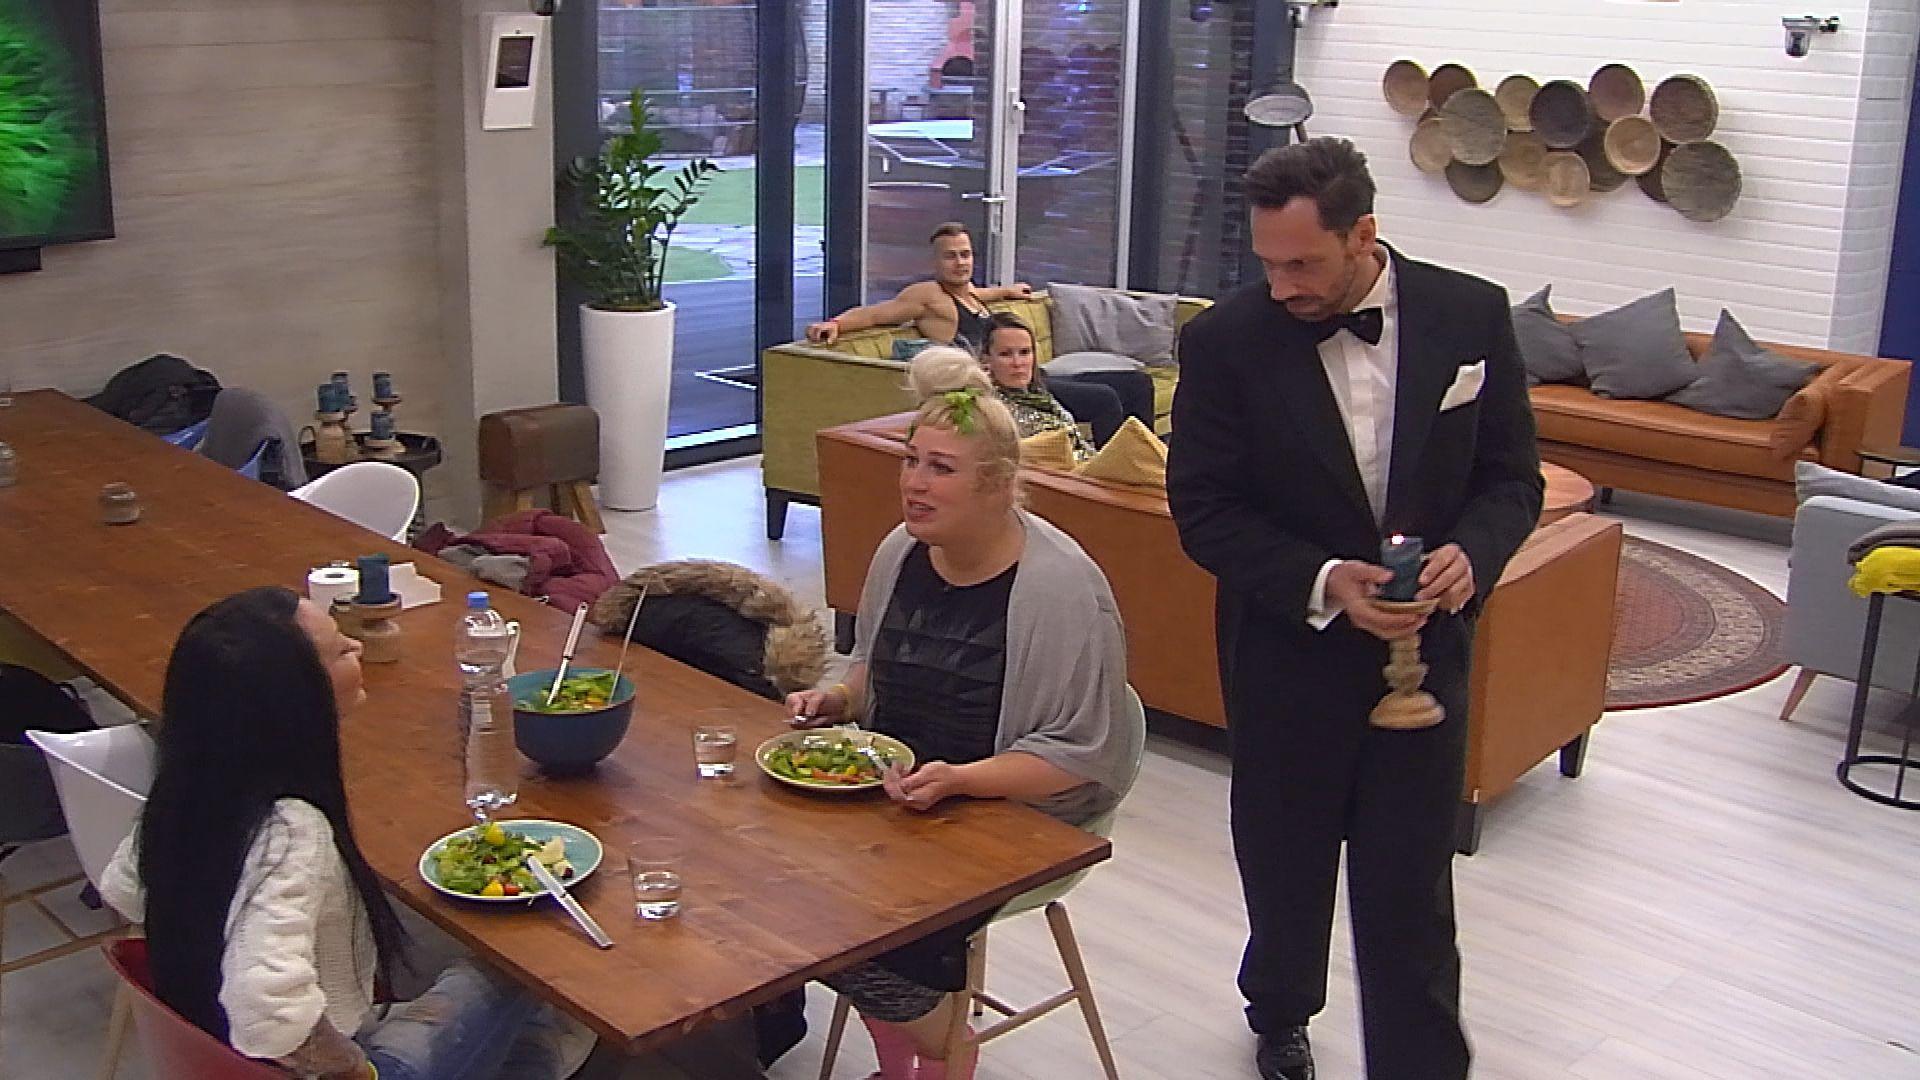 Big Brother Tag 37 - Guido serviert Lusy und Asa Rohkost